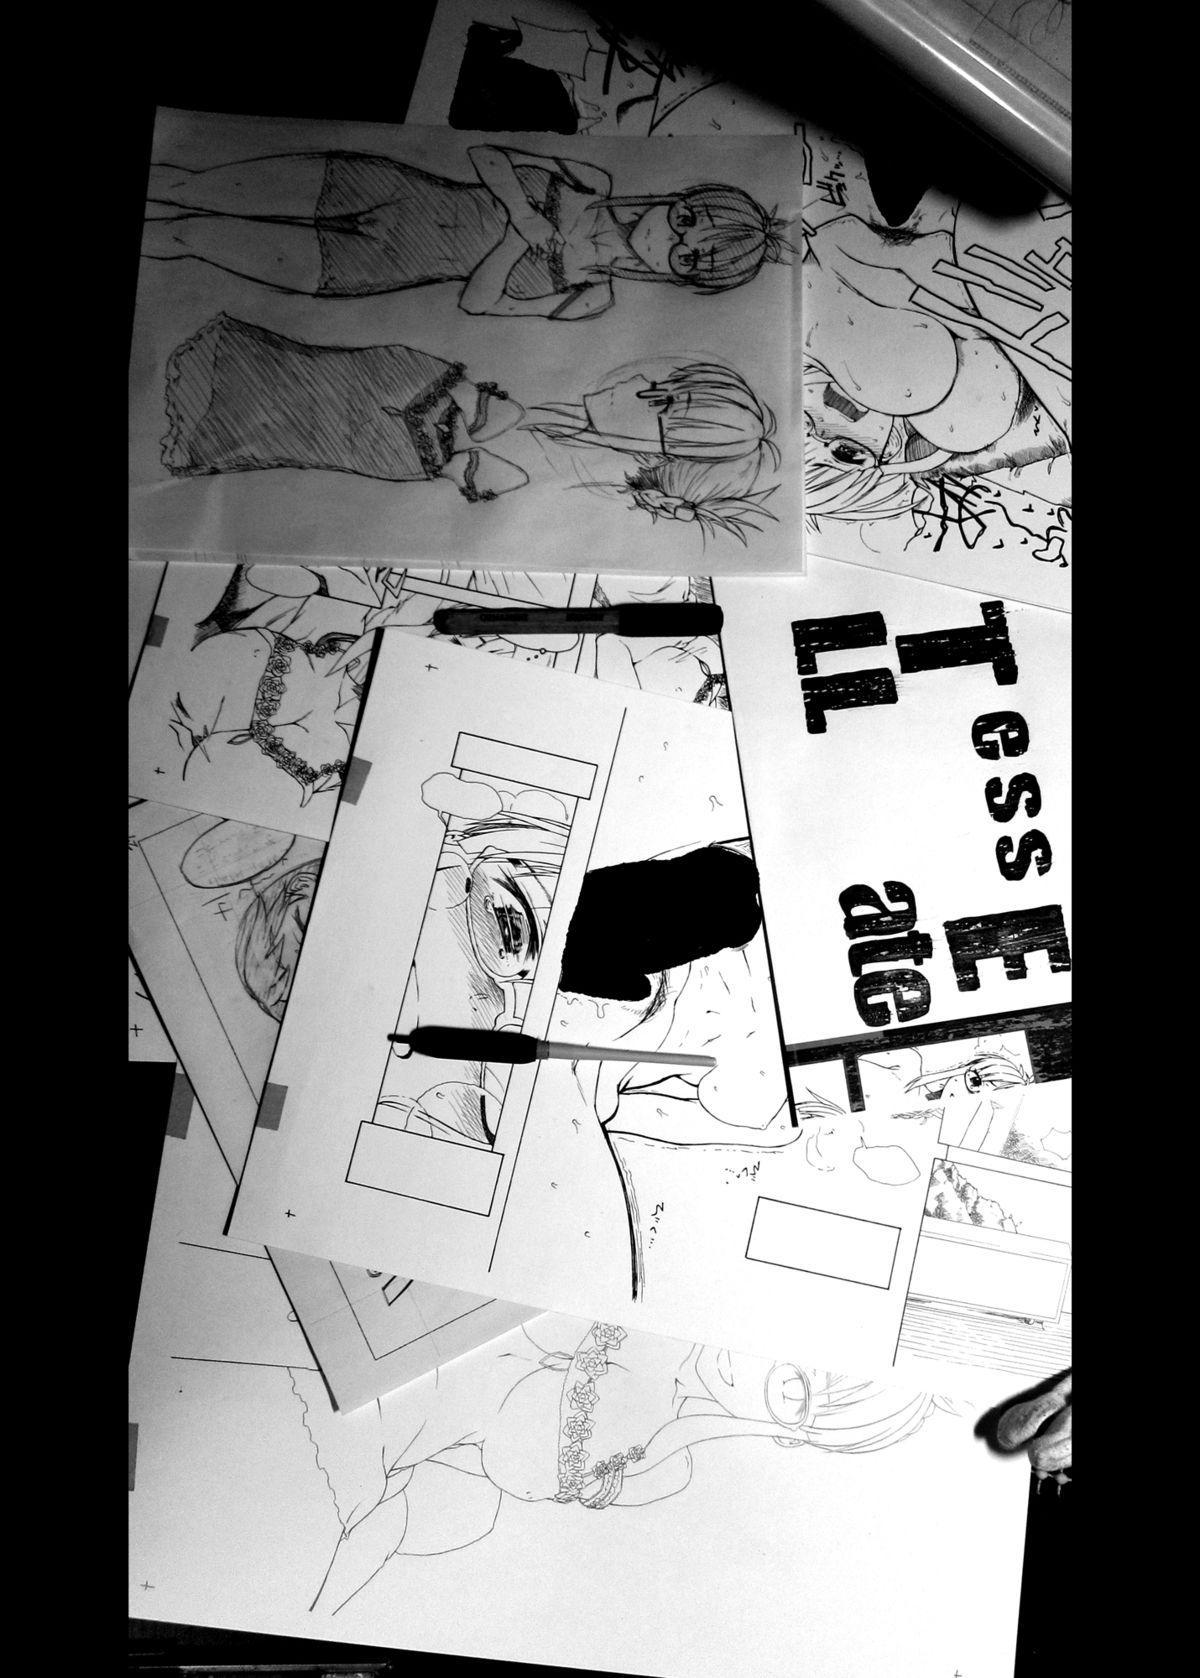 Tessellate 21